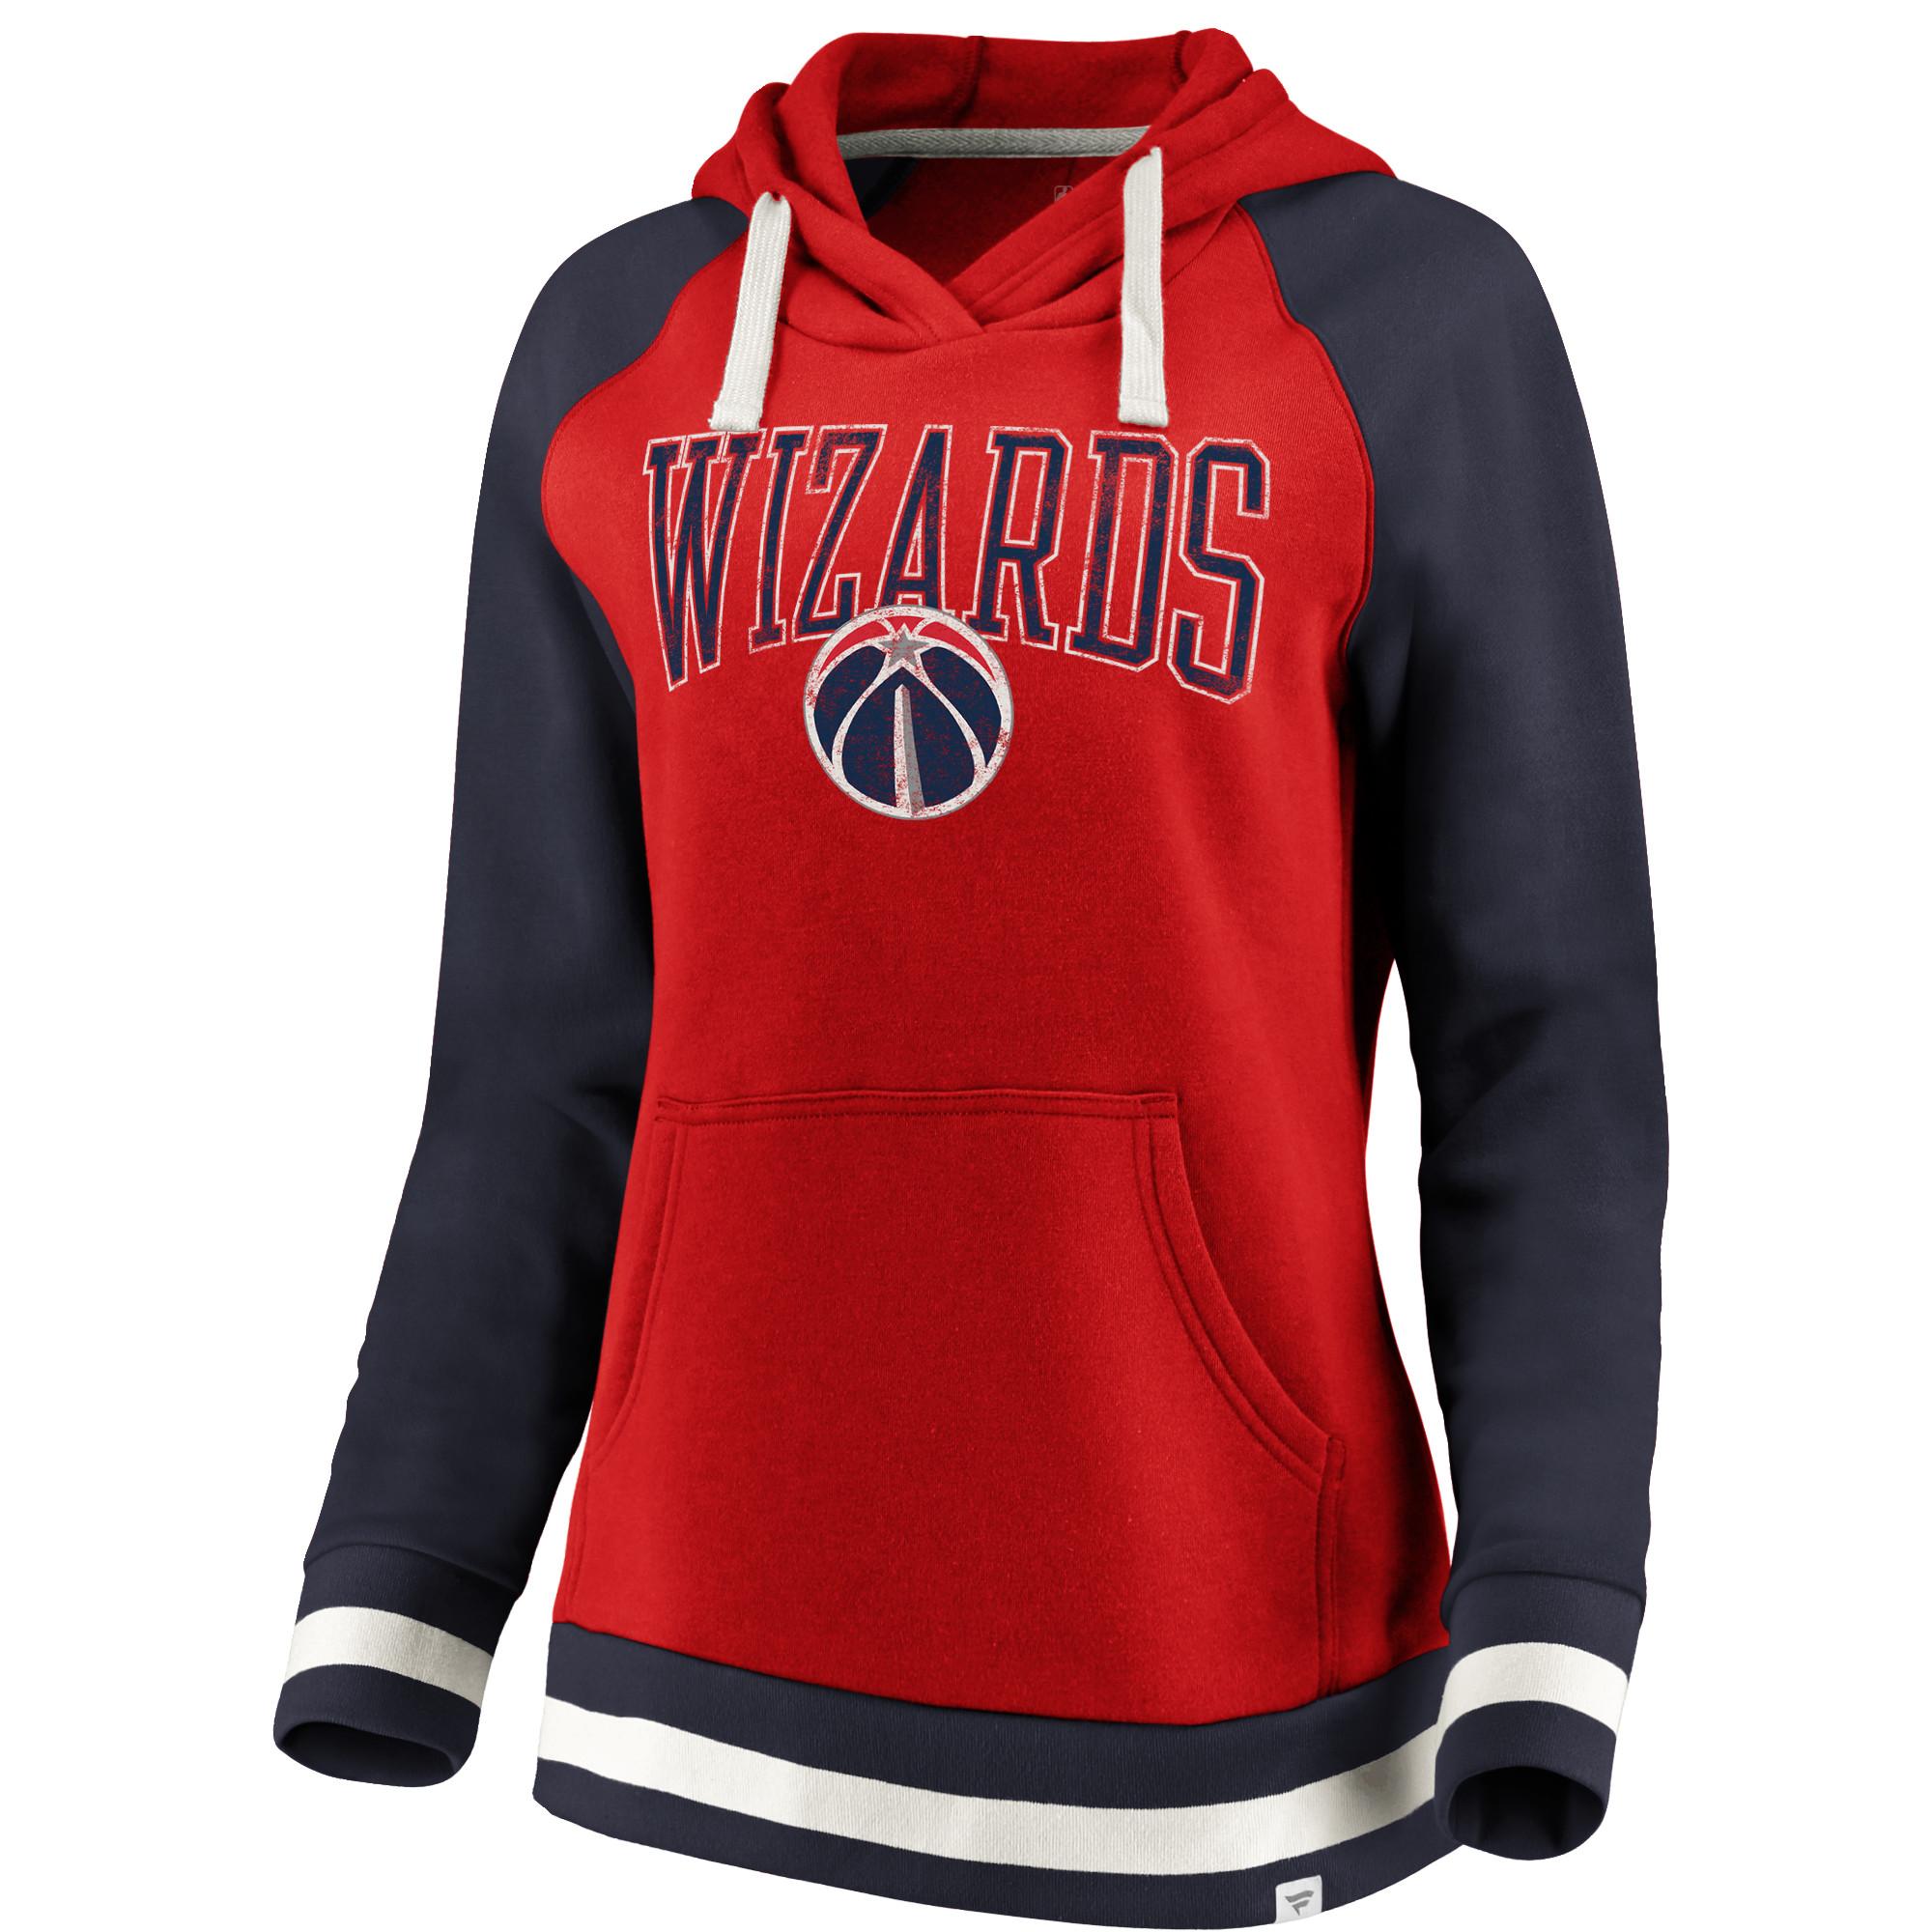 9892f6a19aeb8c Washington Wizards Fanatics Branded Women s True Classic Vintage Retro  Stripe Raglan Fleece Pullover Hoodie - Red Navy